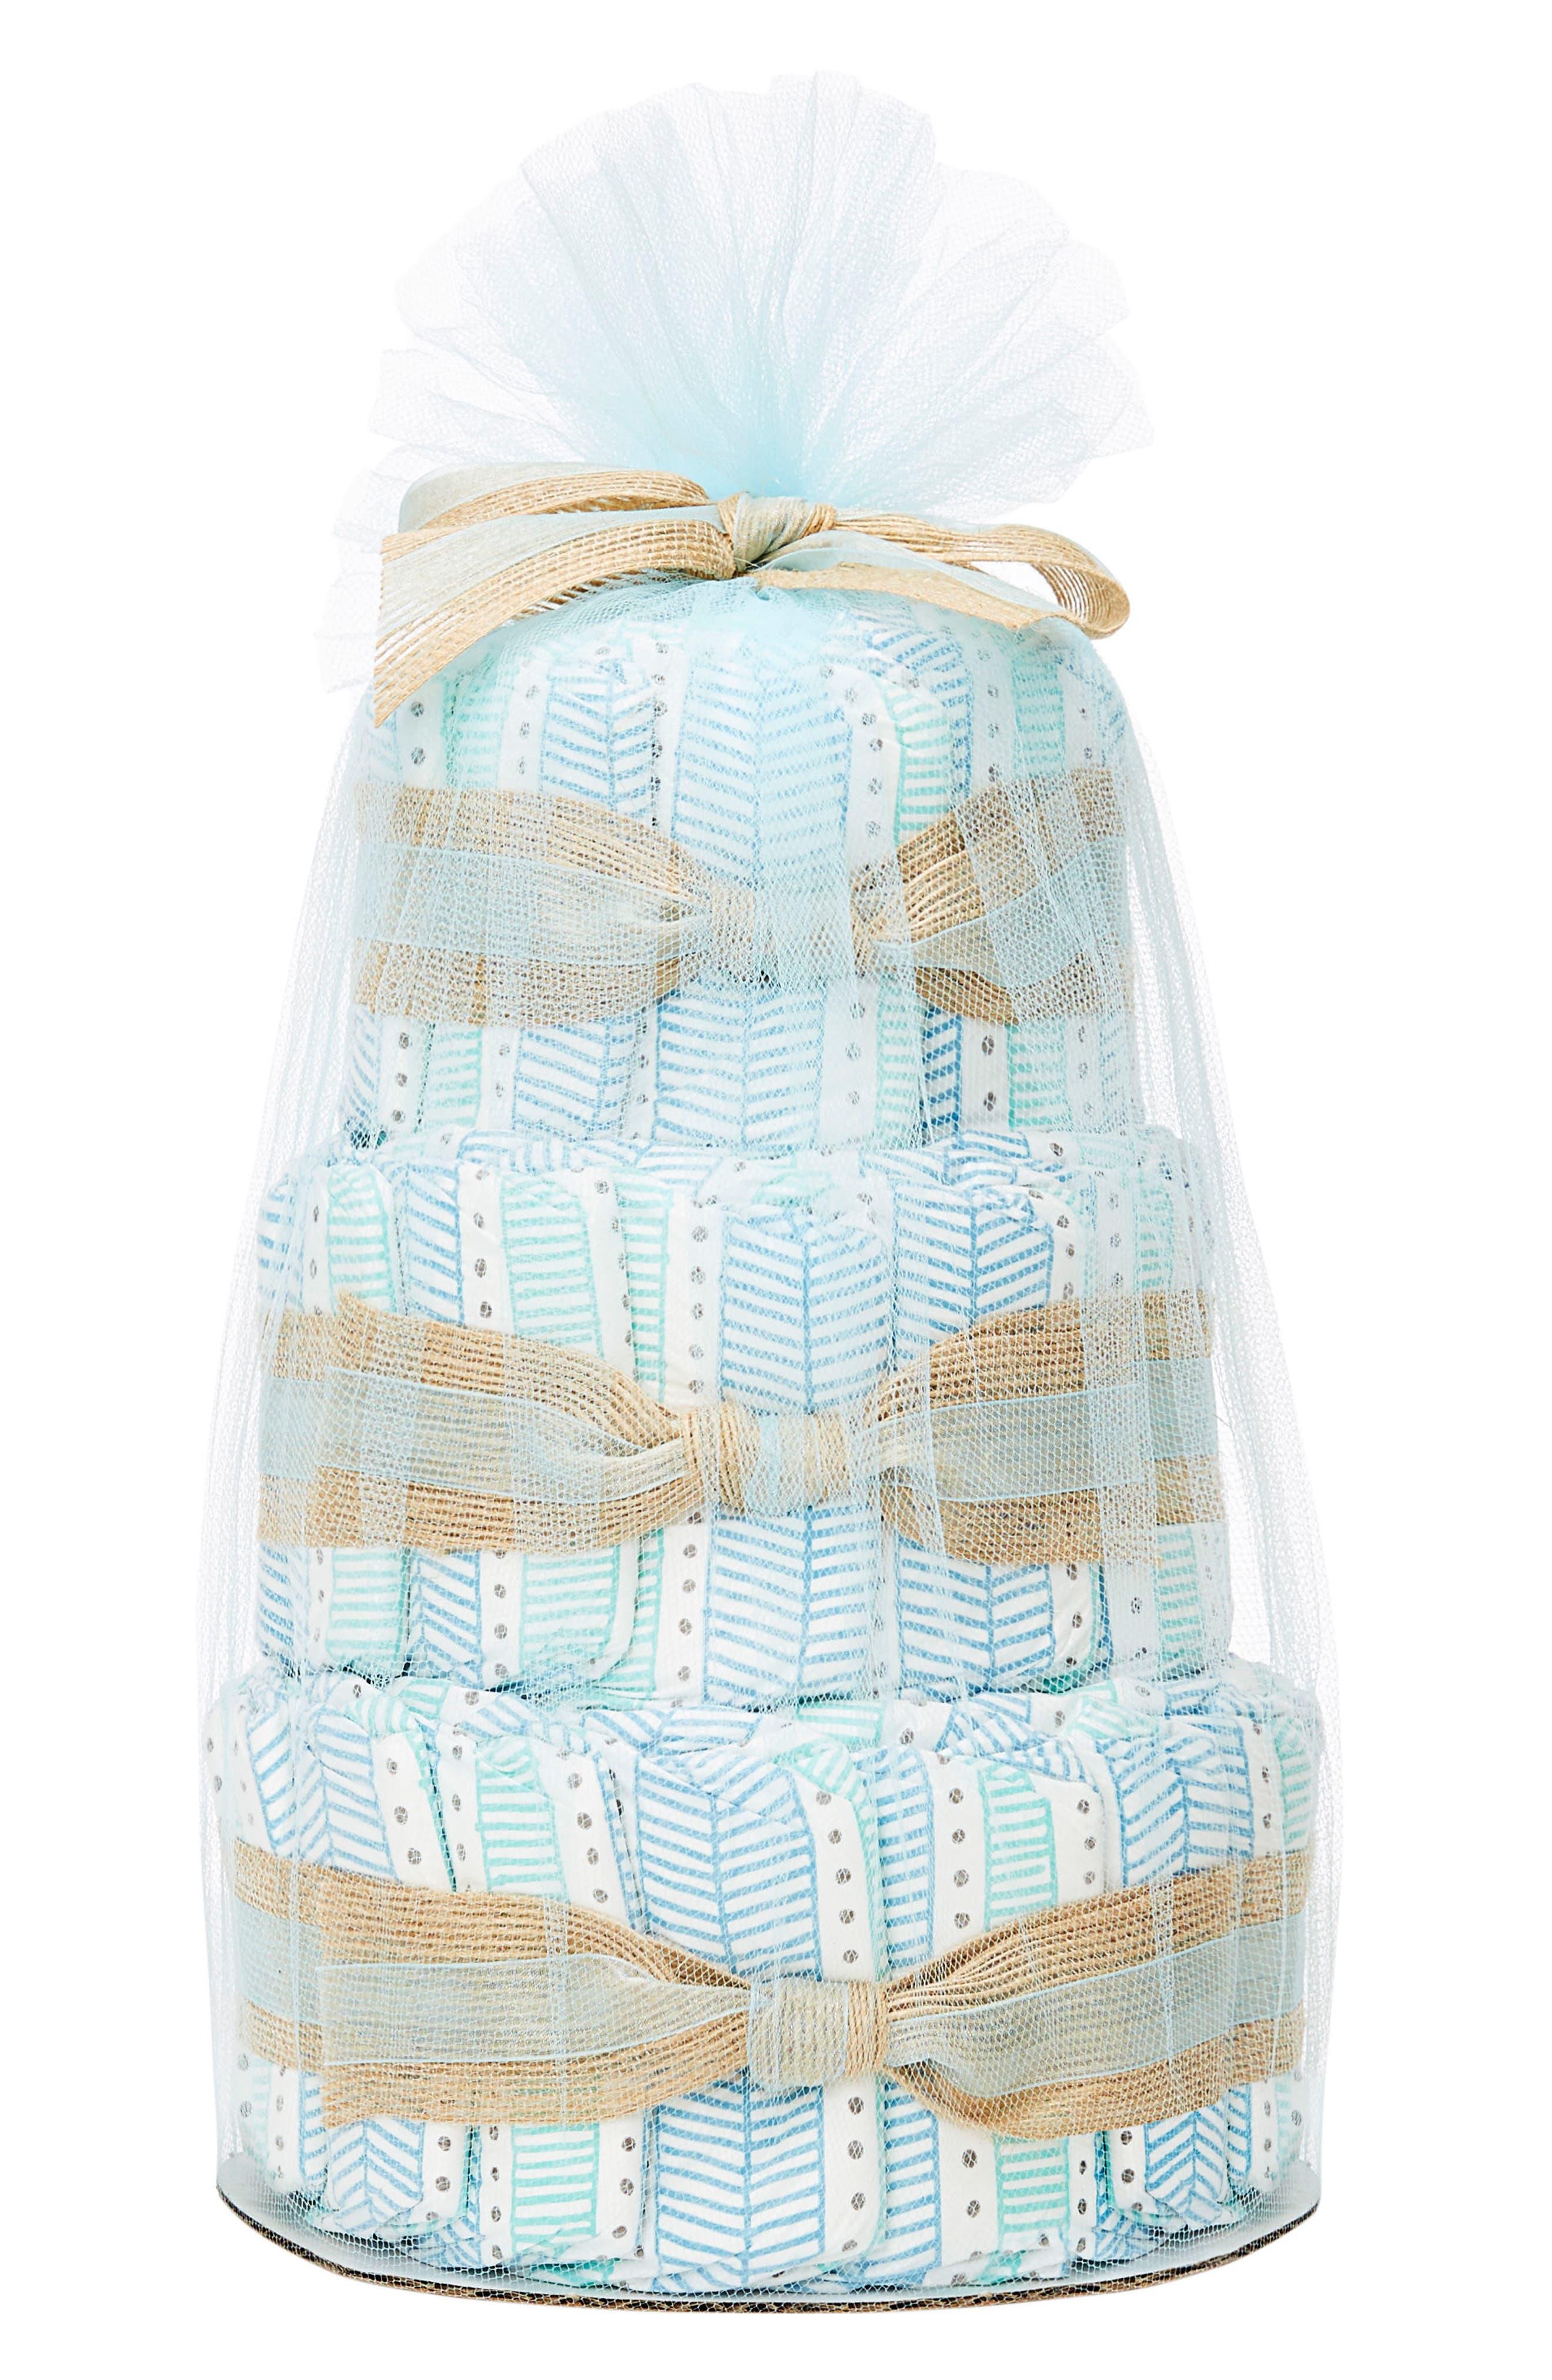 Mini Diaper Cake & Travel-Size Essentials Set,                             Main thumbnail 1, color,                             Teal Tribal